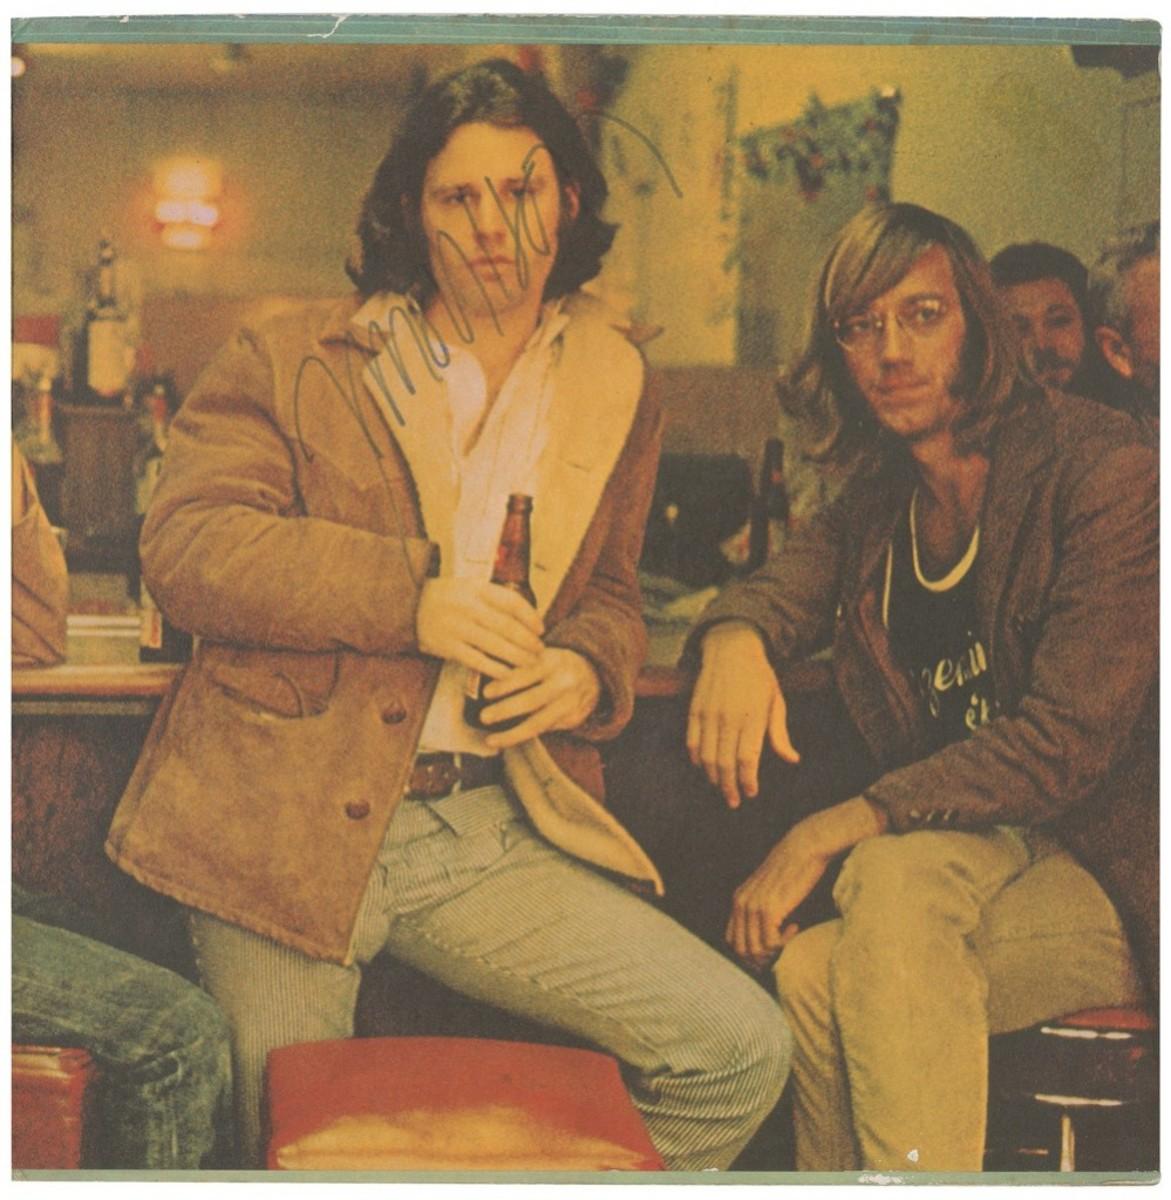 Jim Morrison signed Morrison Hotel album